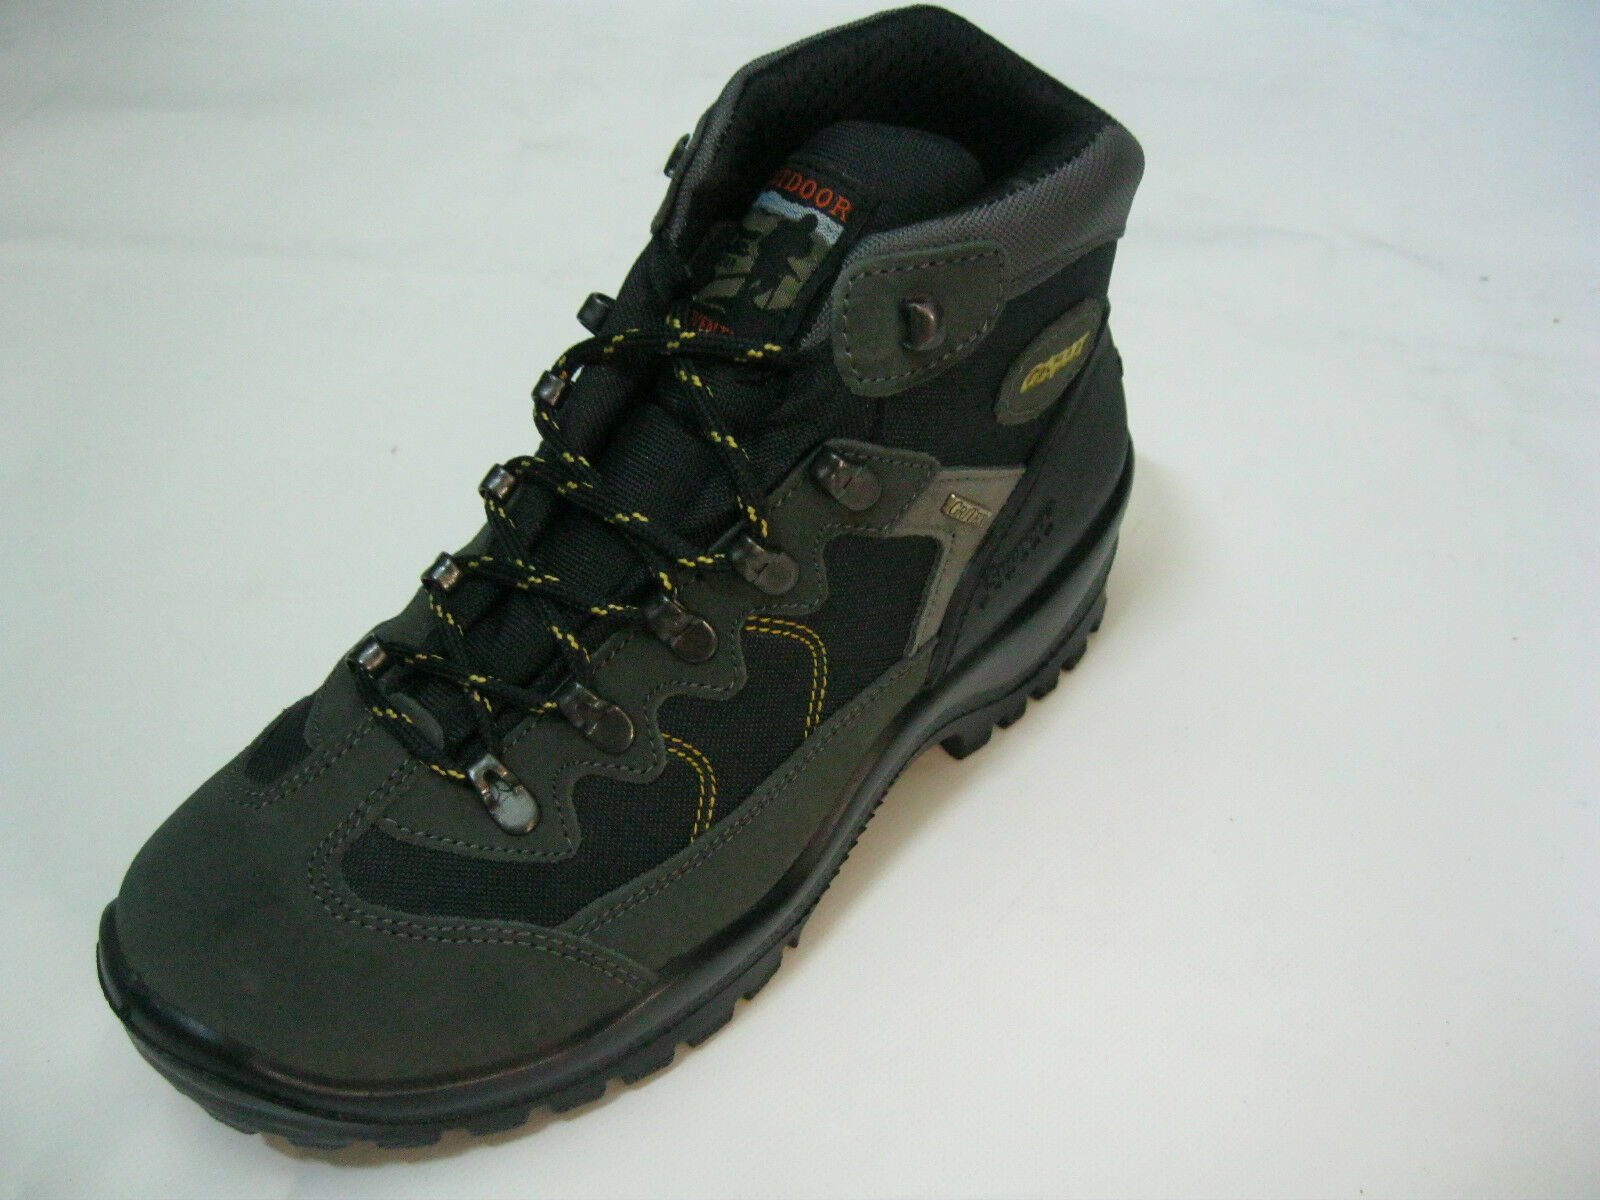 Scarponcino - scarpa da trekking uomo-donna-sottuomo Grisport 10694S12G 3618